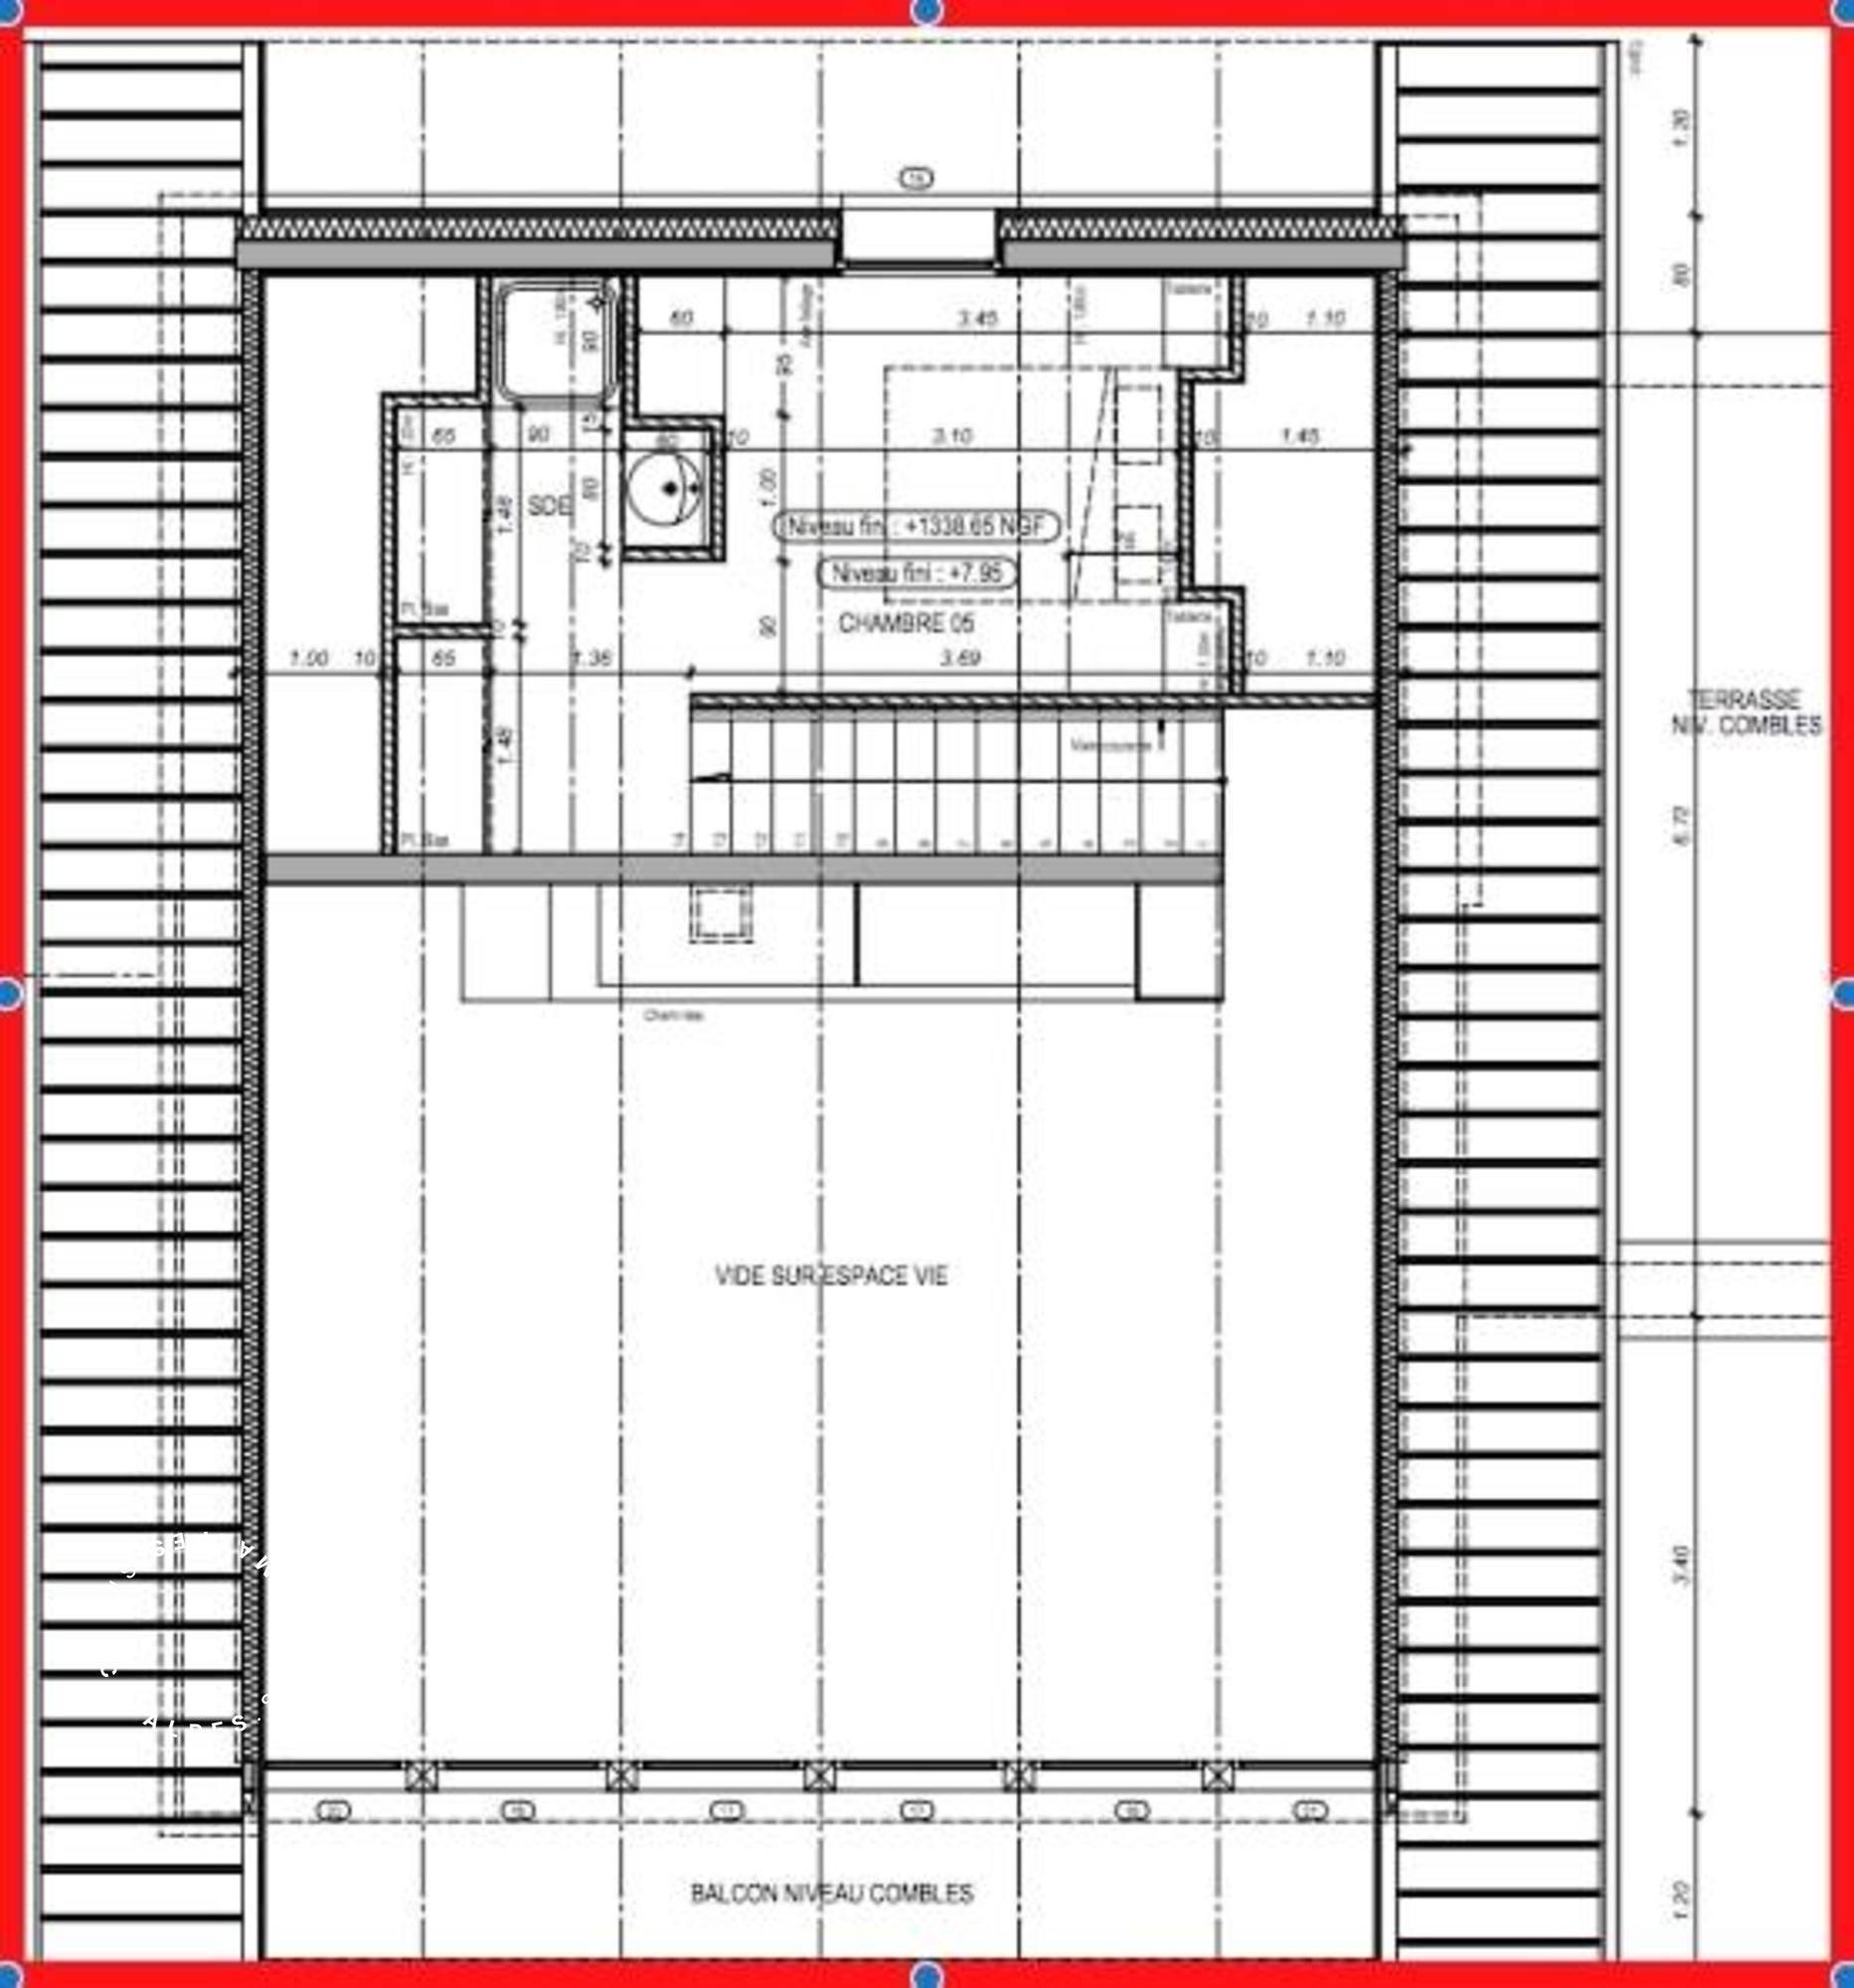 Chalet Home 1 St-Martin-de-Belleville Floor Plan 3